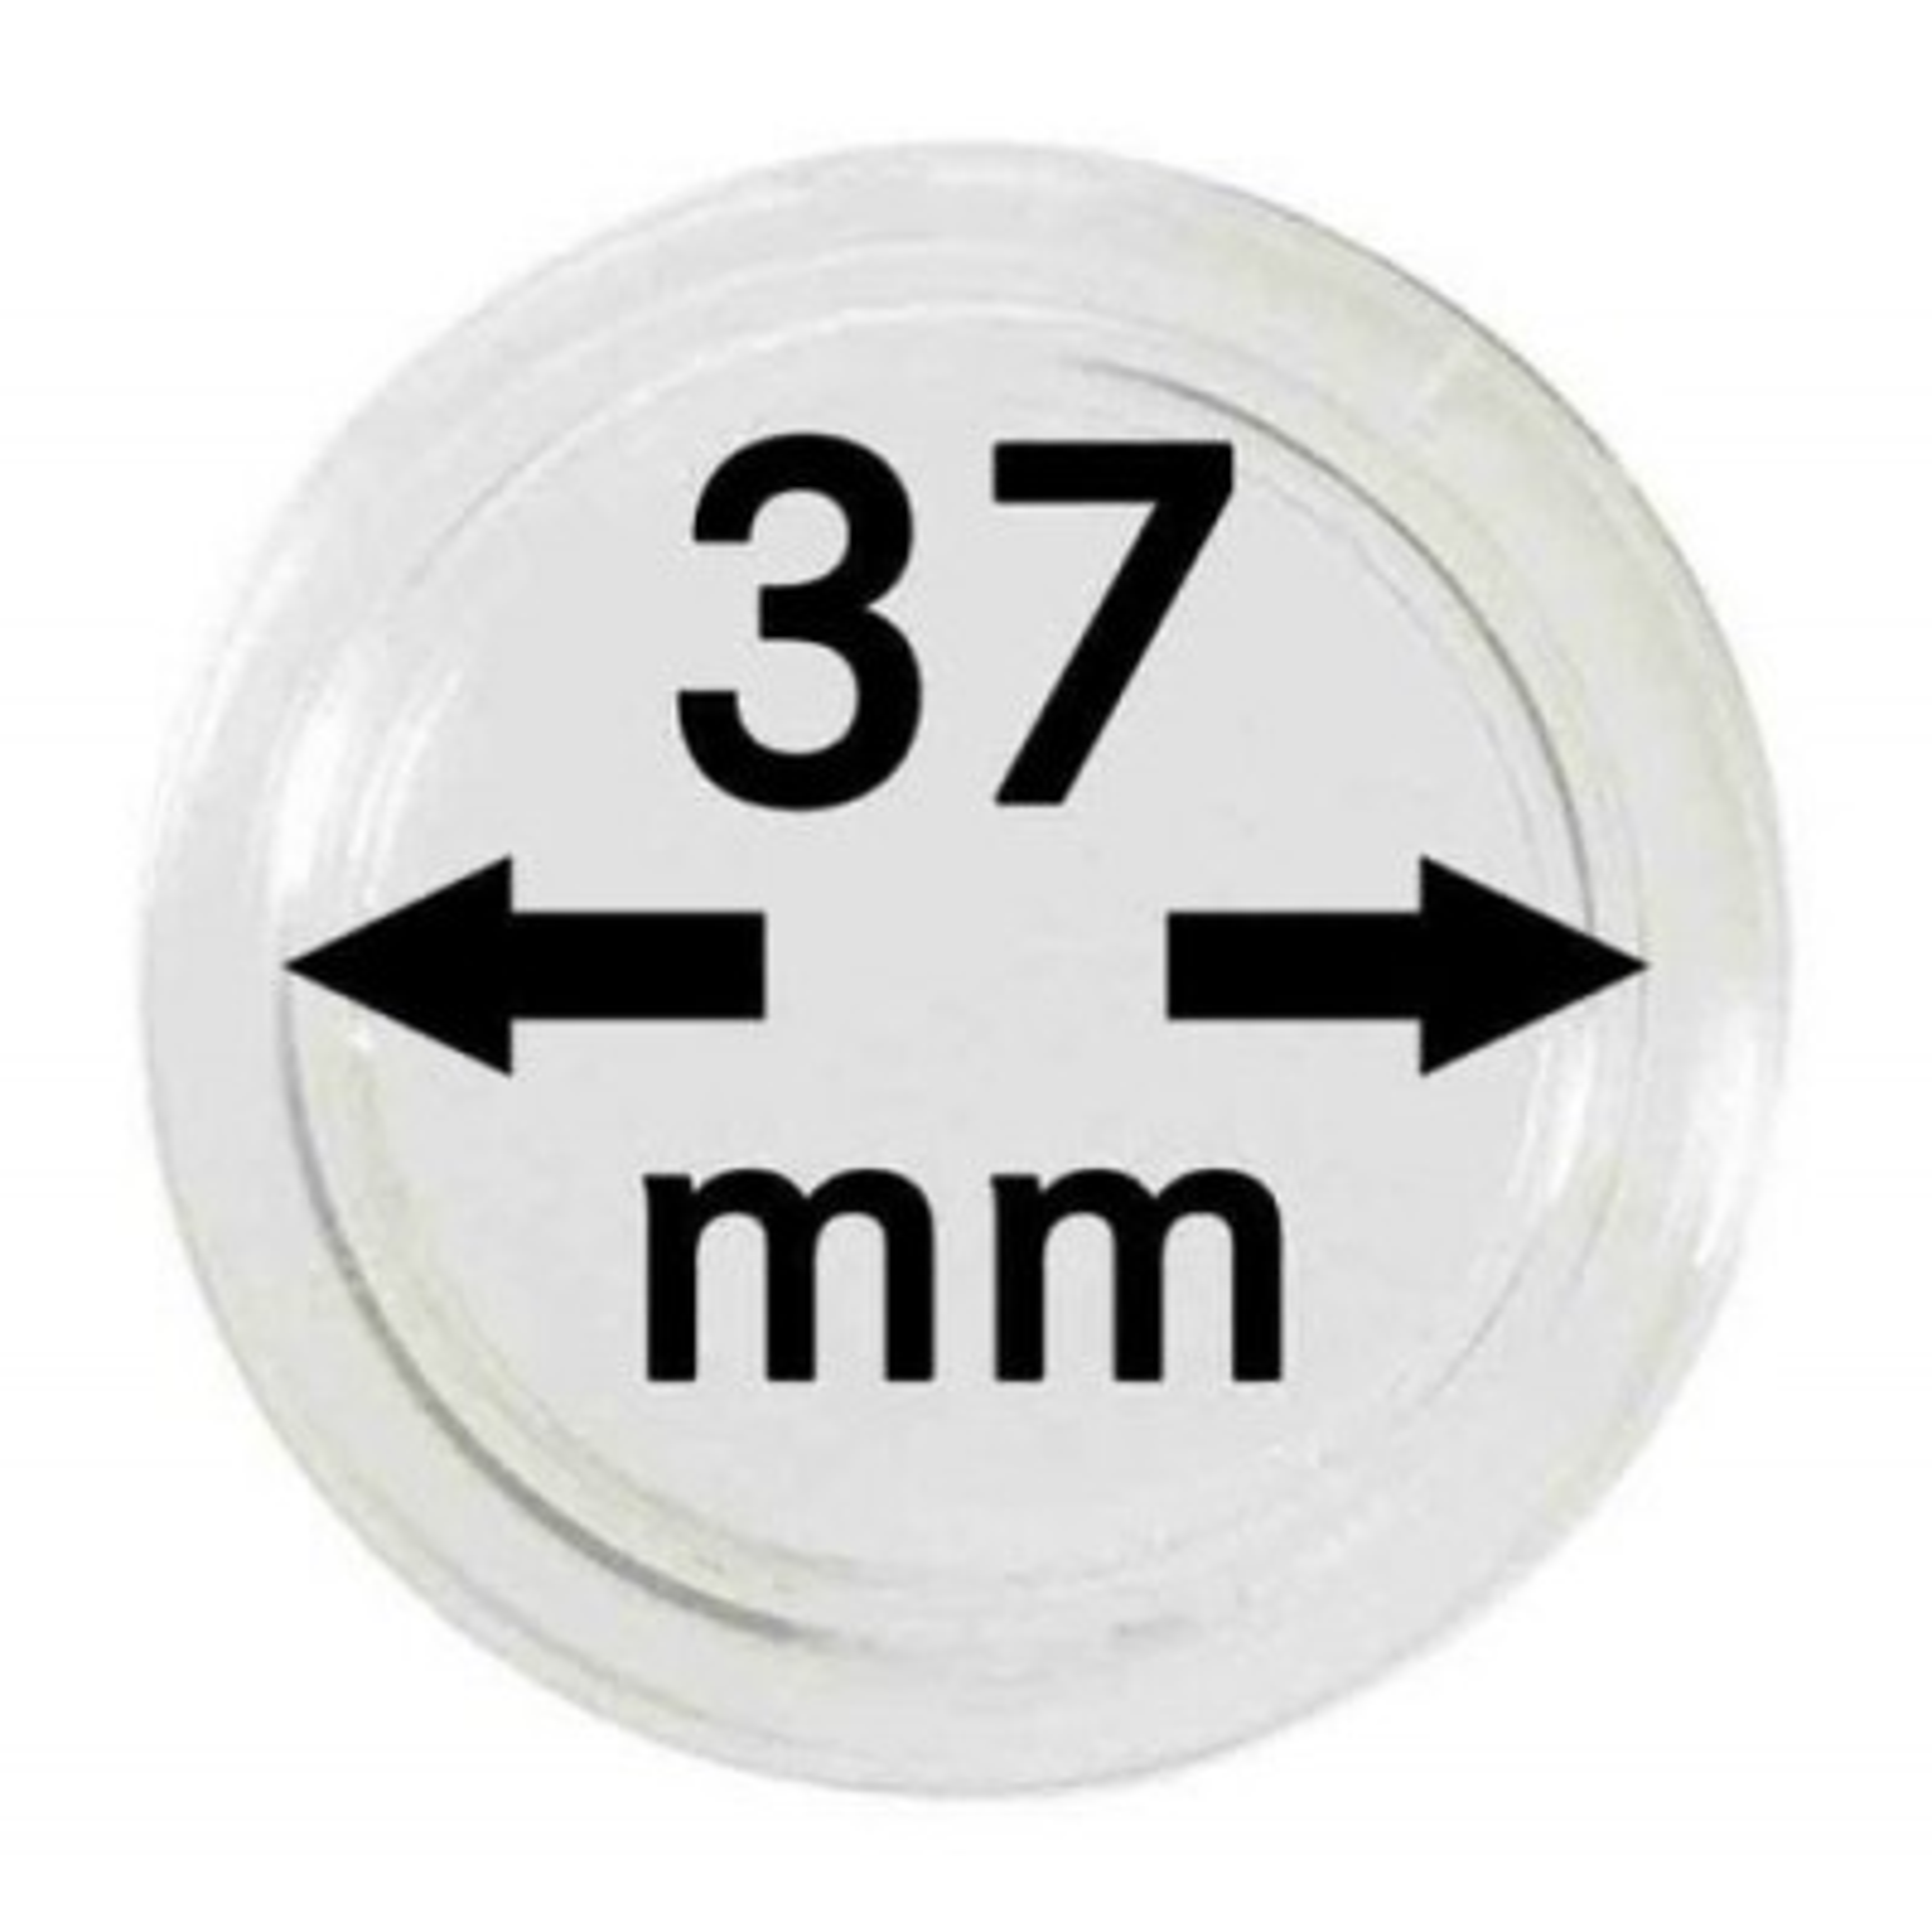 Leuchtturm muntcapsules 37mm